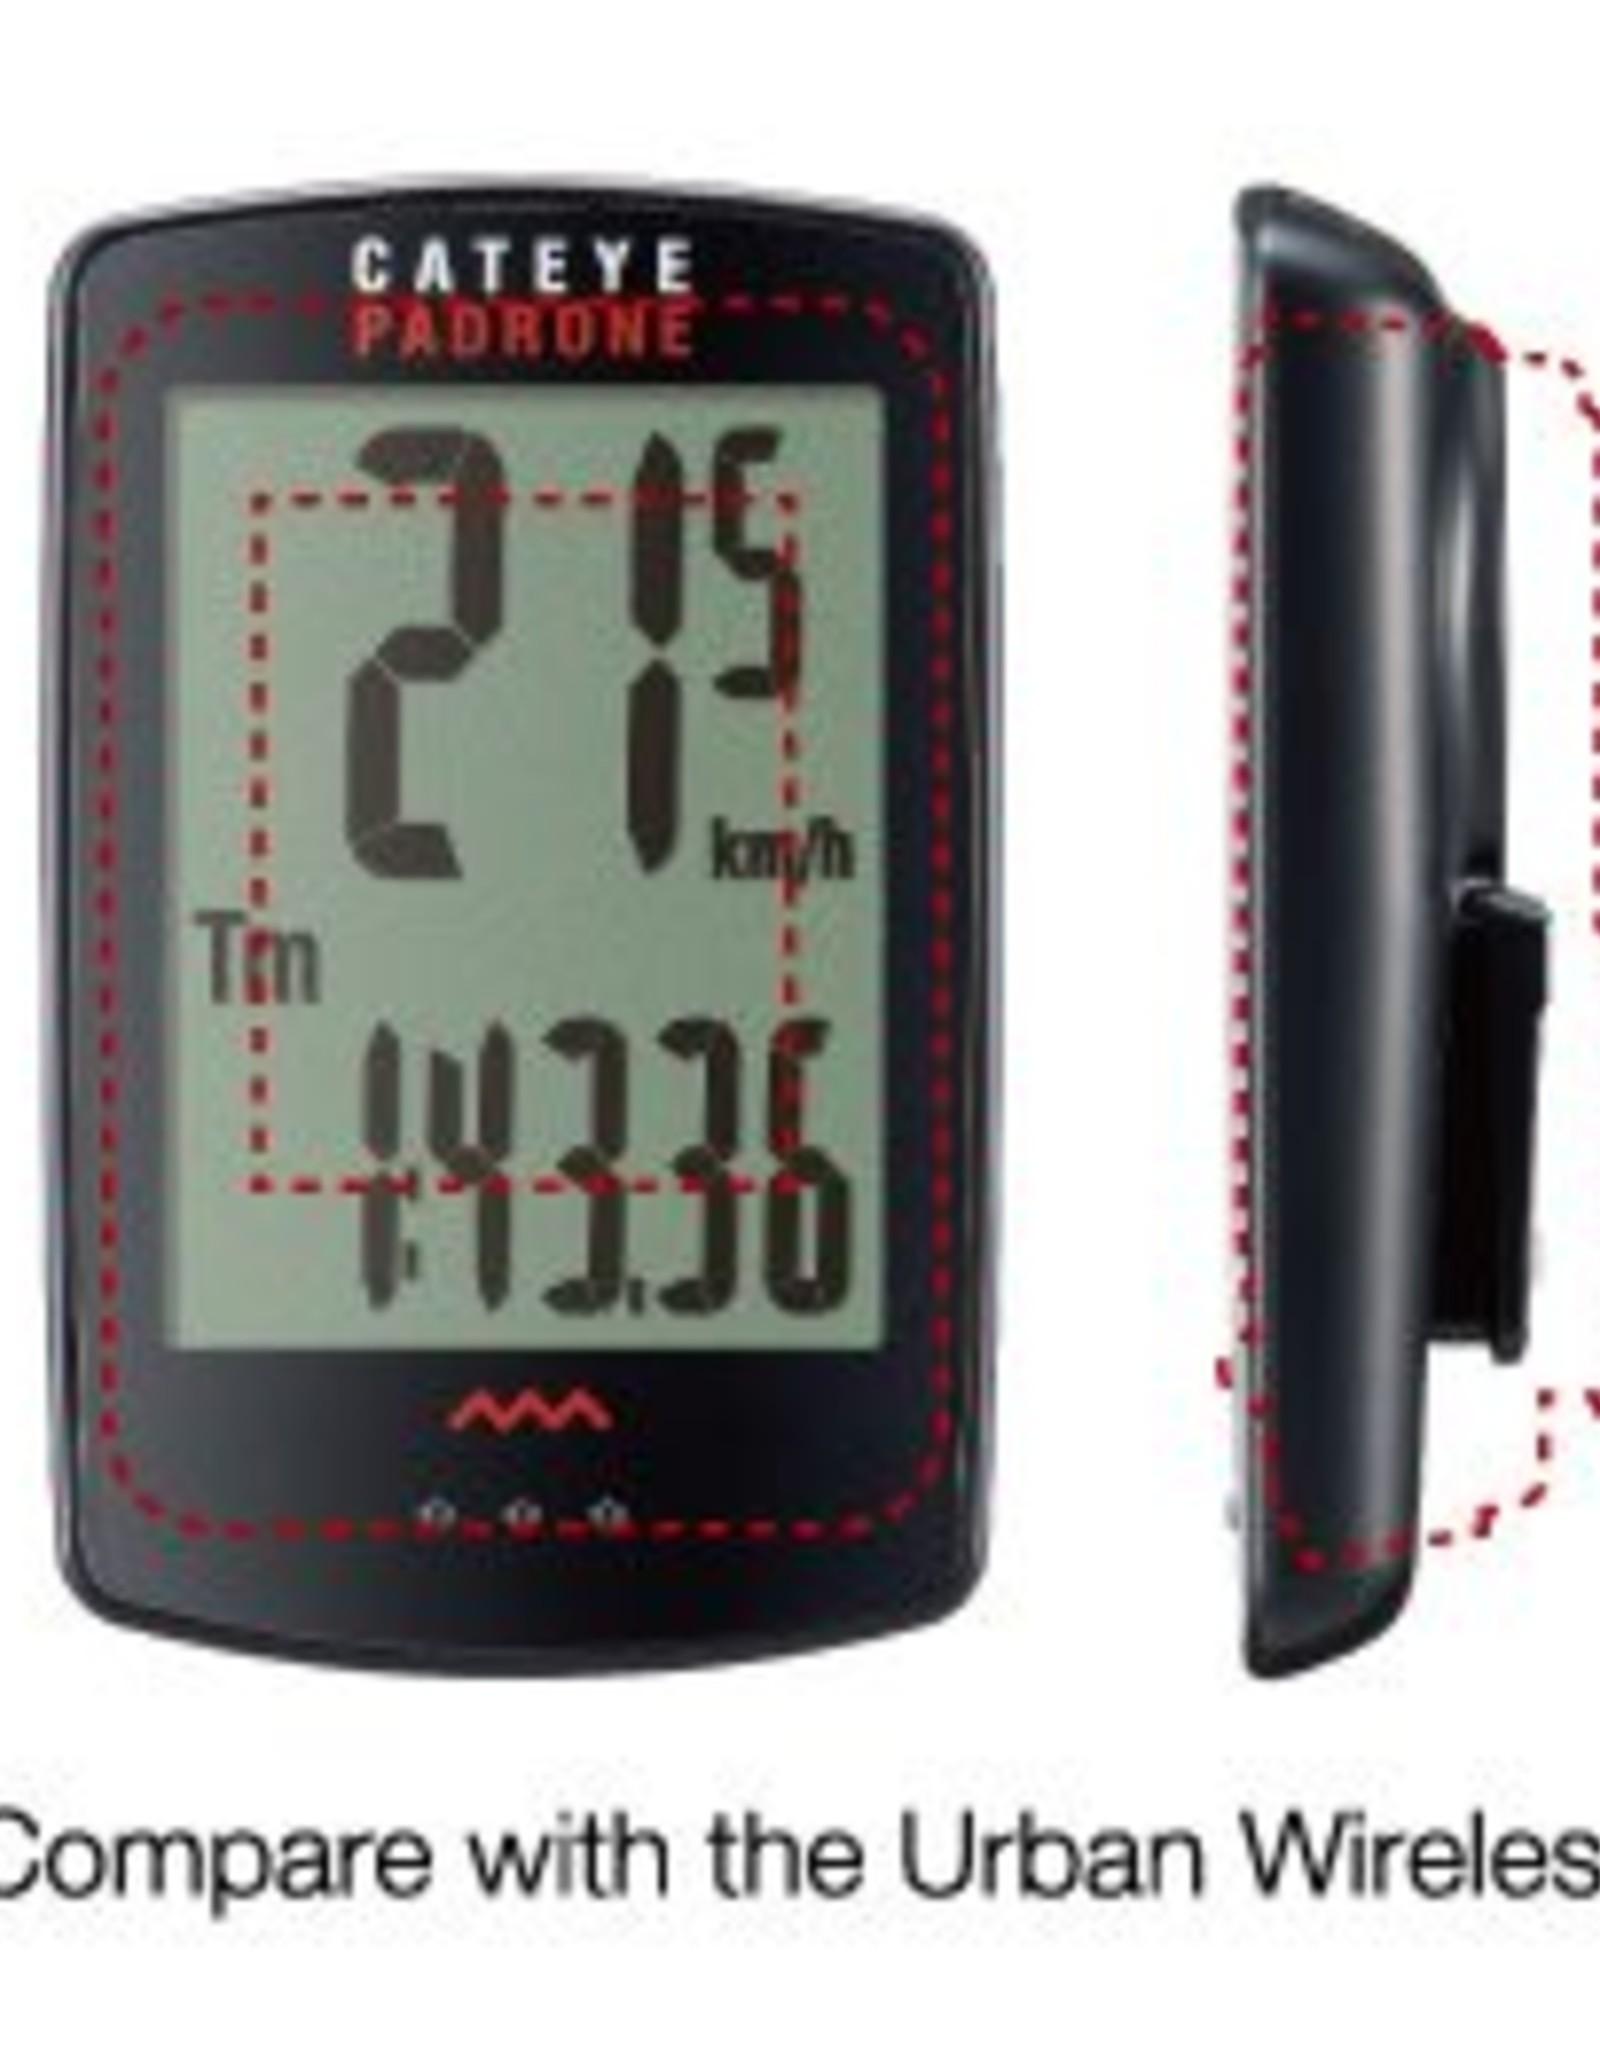 CatEye Cateye Padrone CC-PA100W Wireless Computer